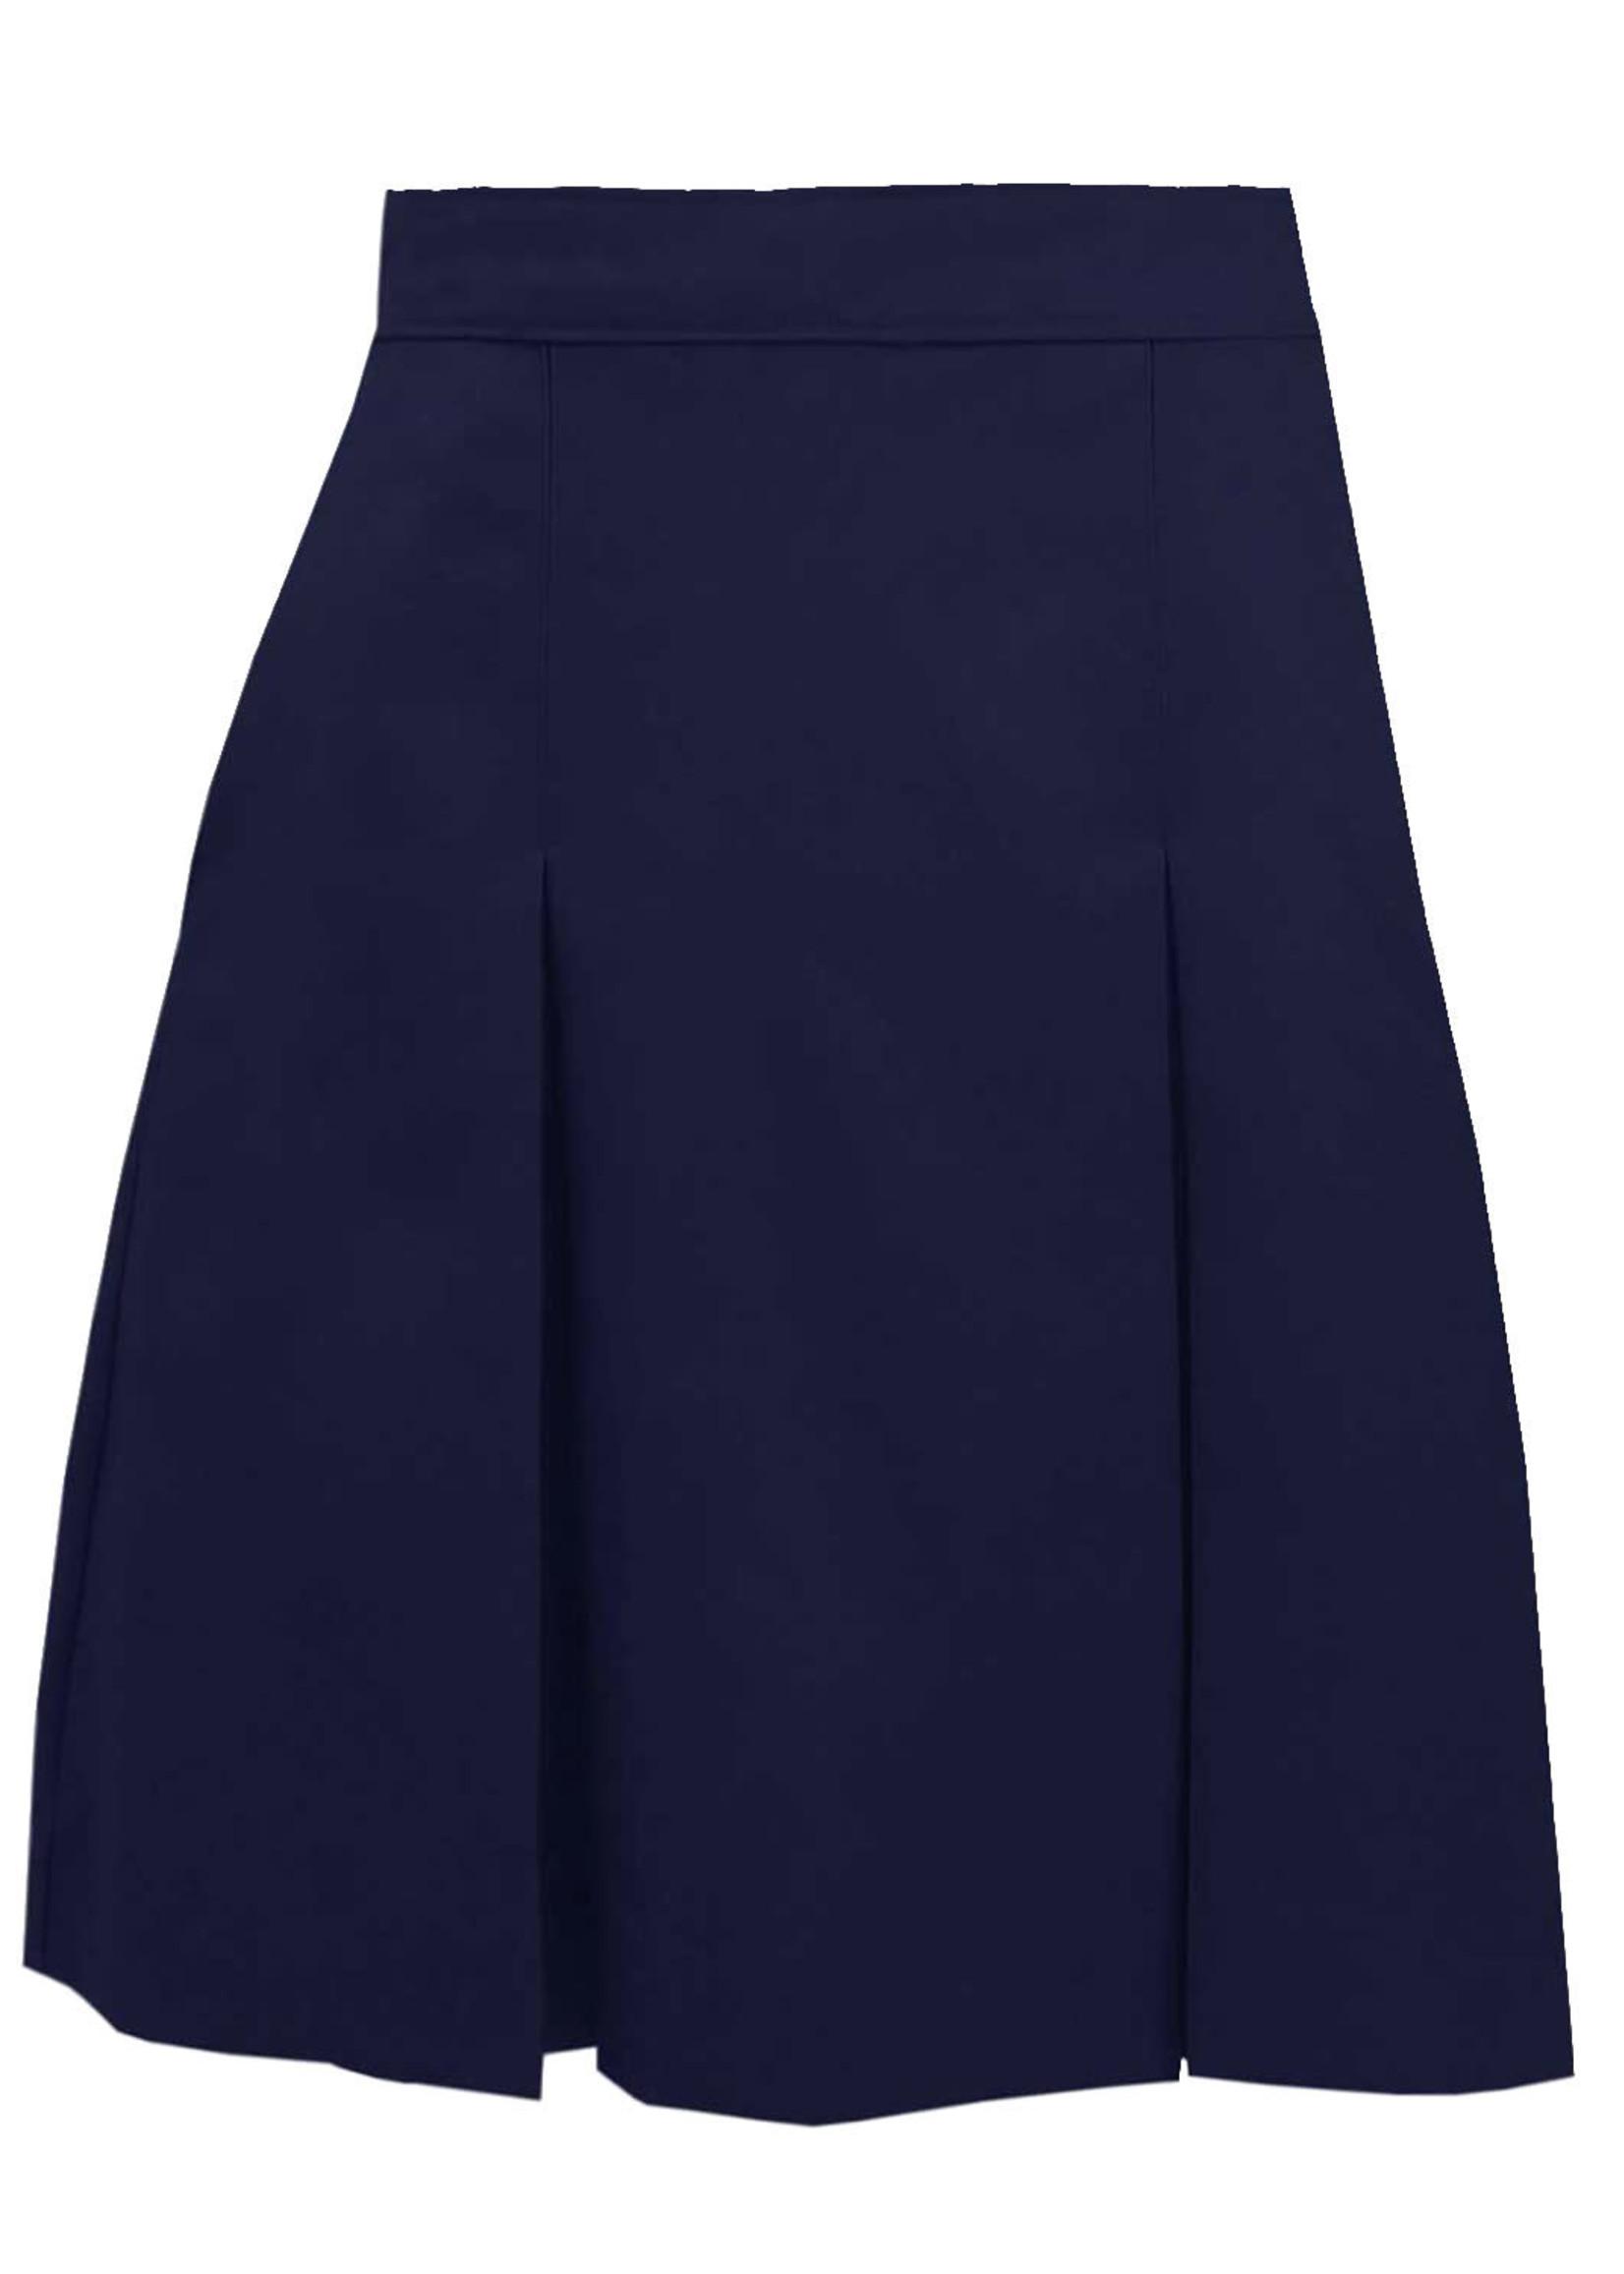 Navy 4 Pleat Solid Skirt